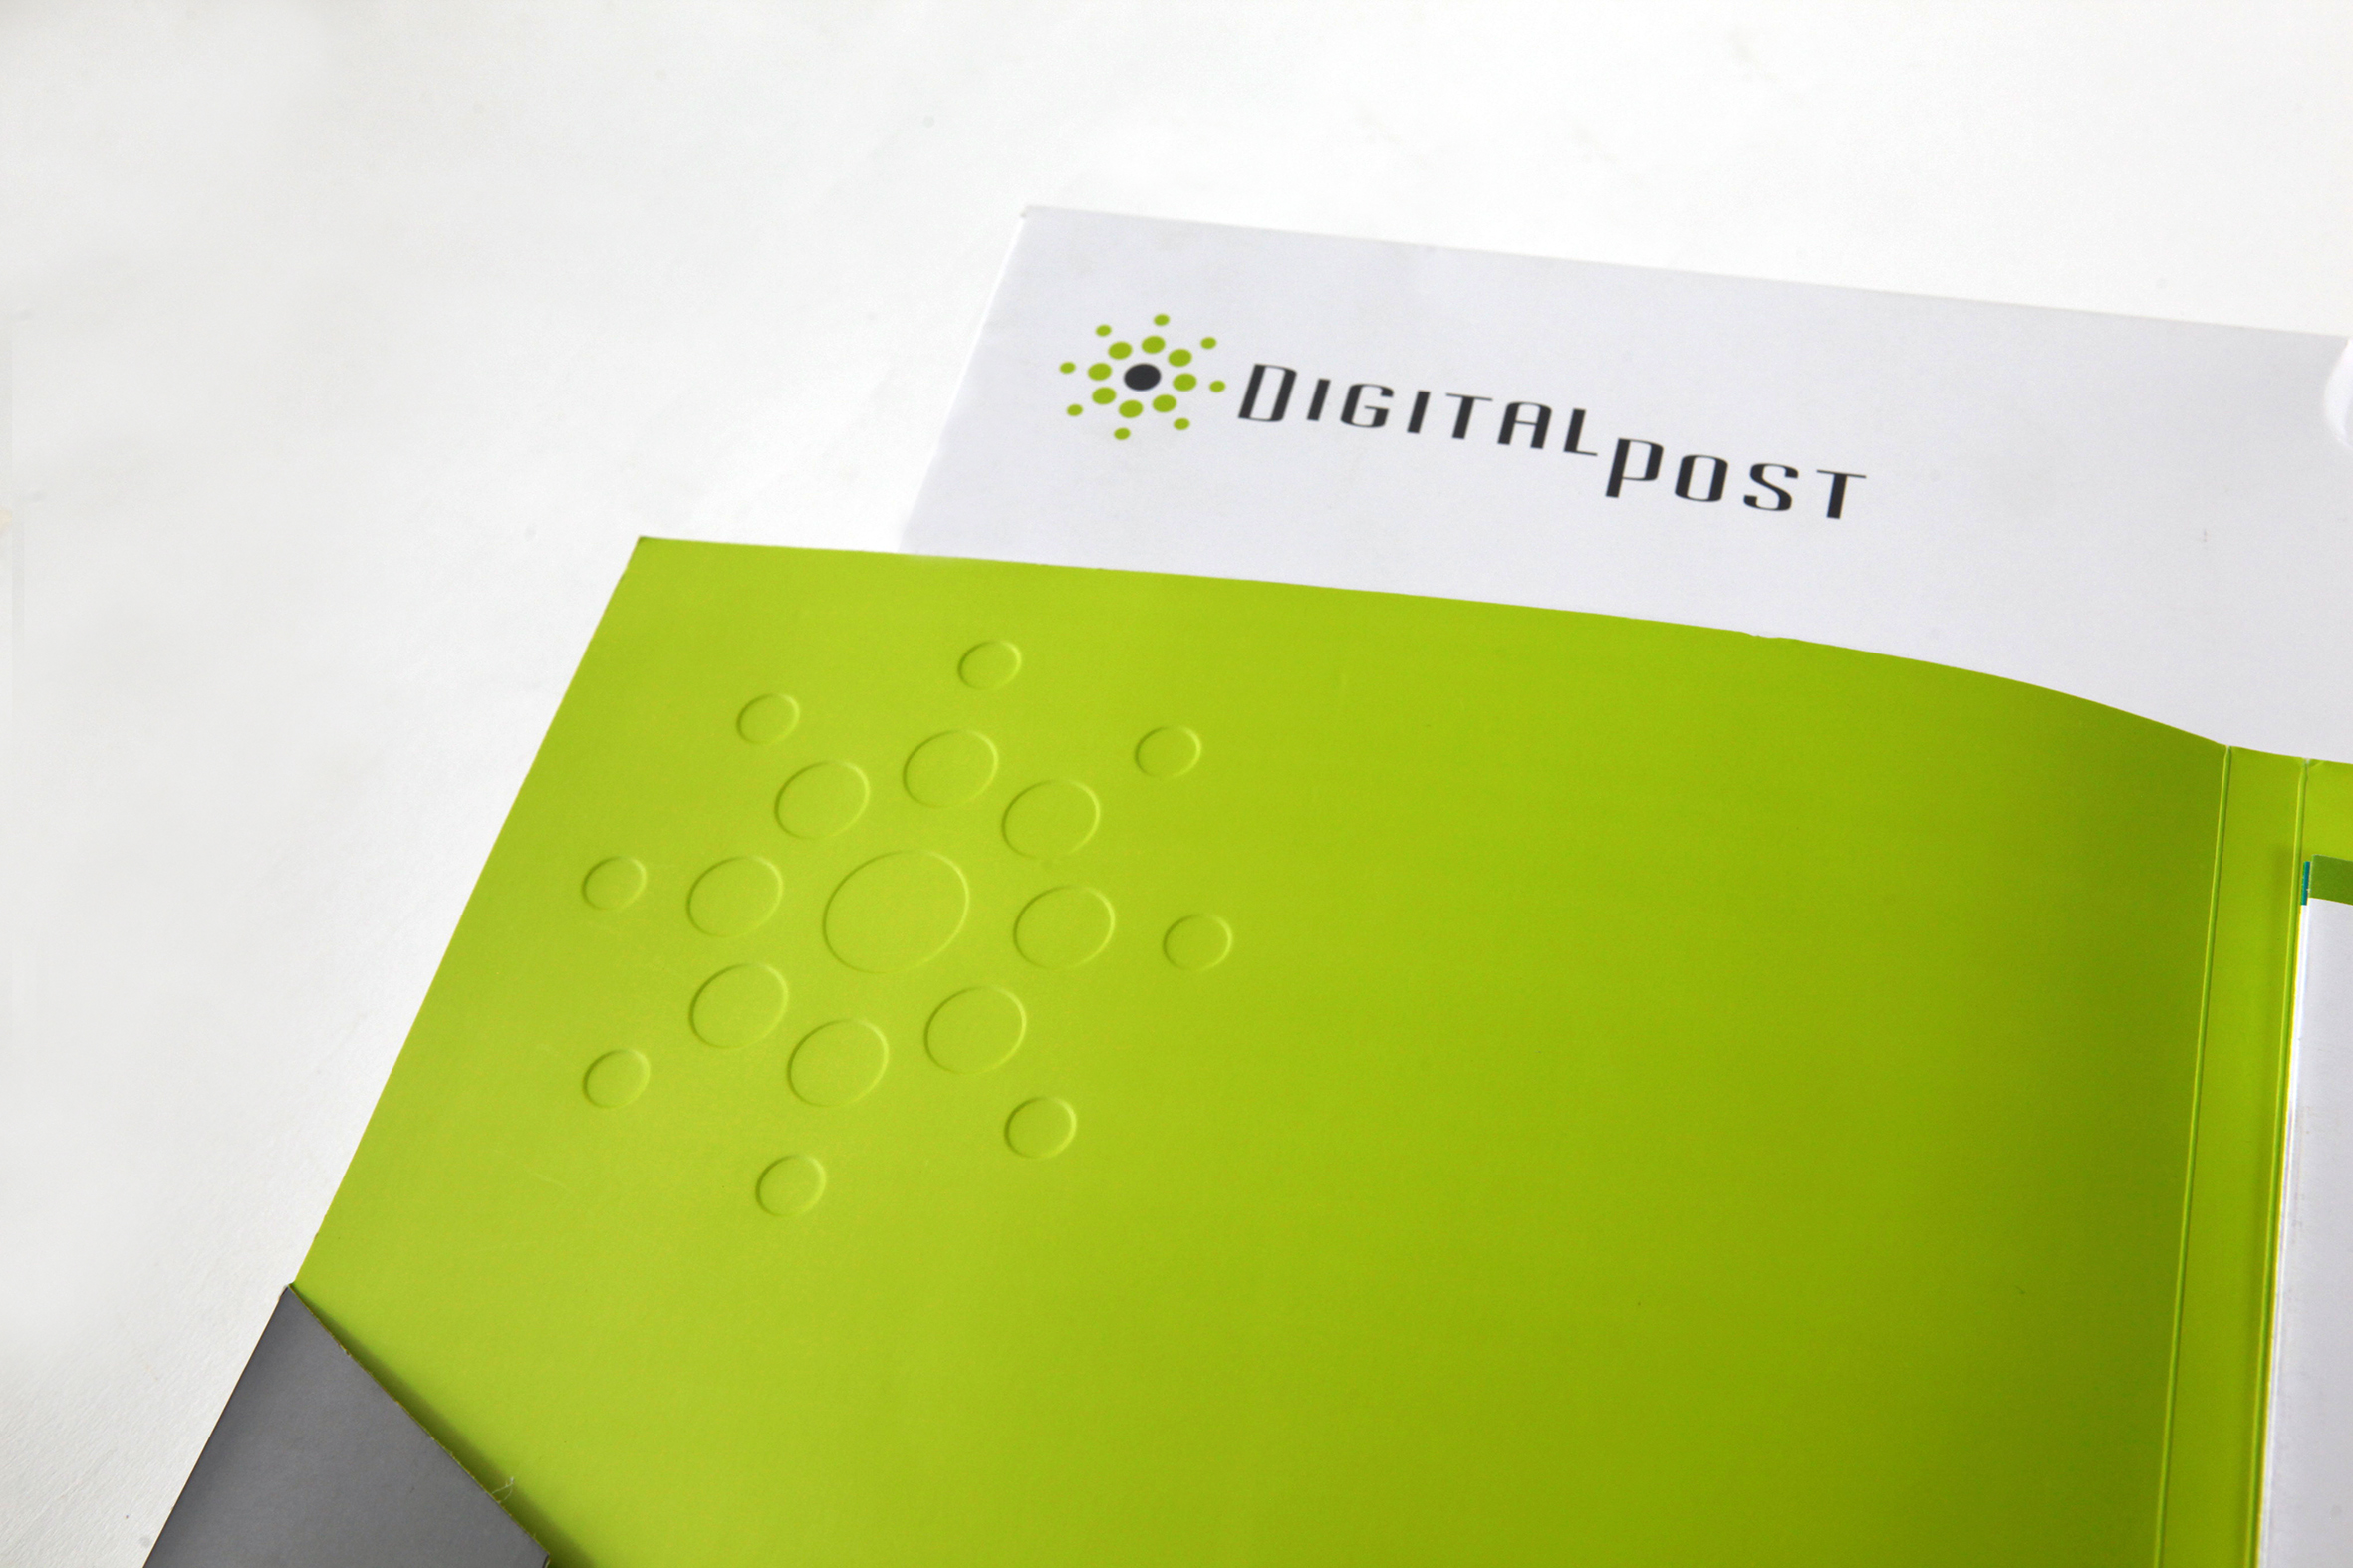 pasta digital post